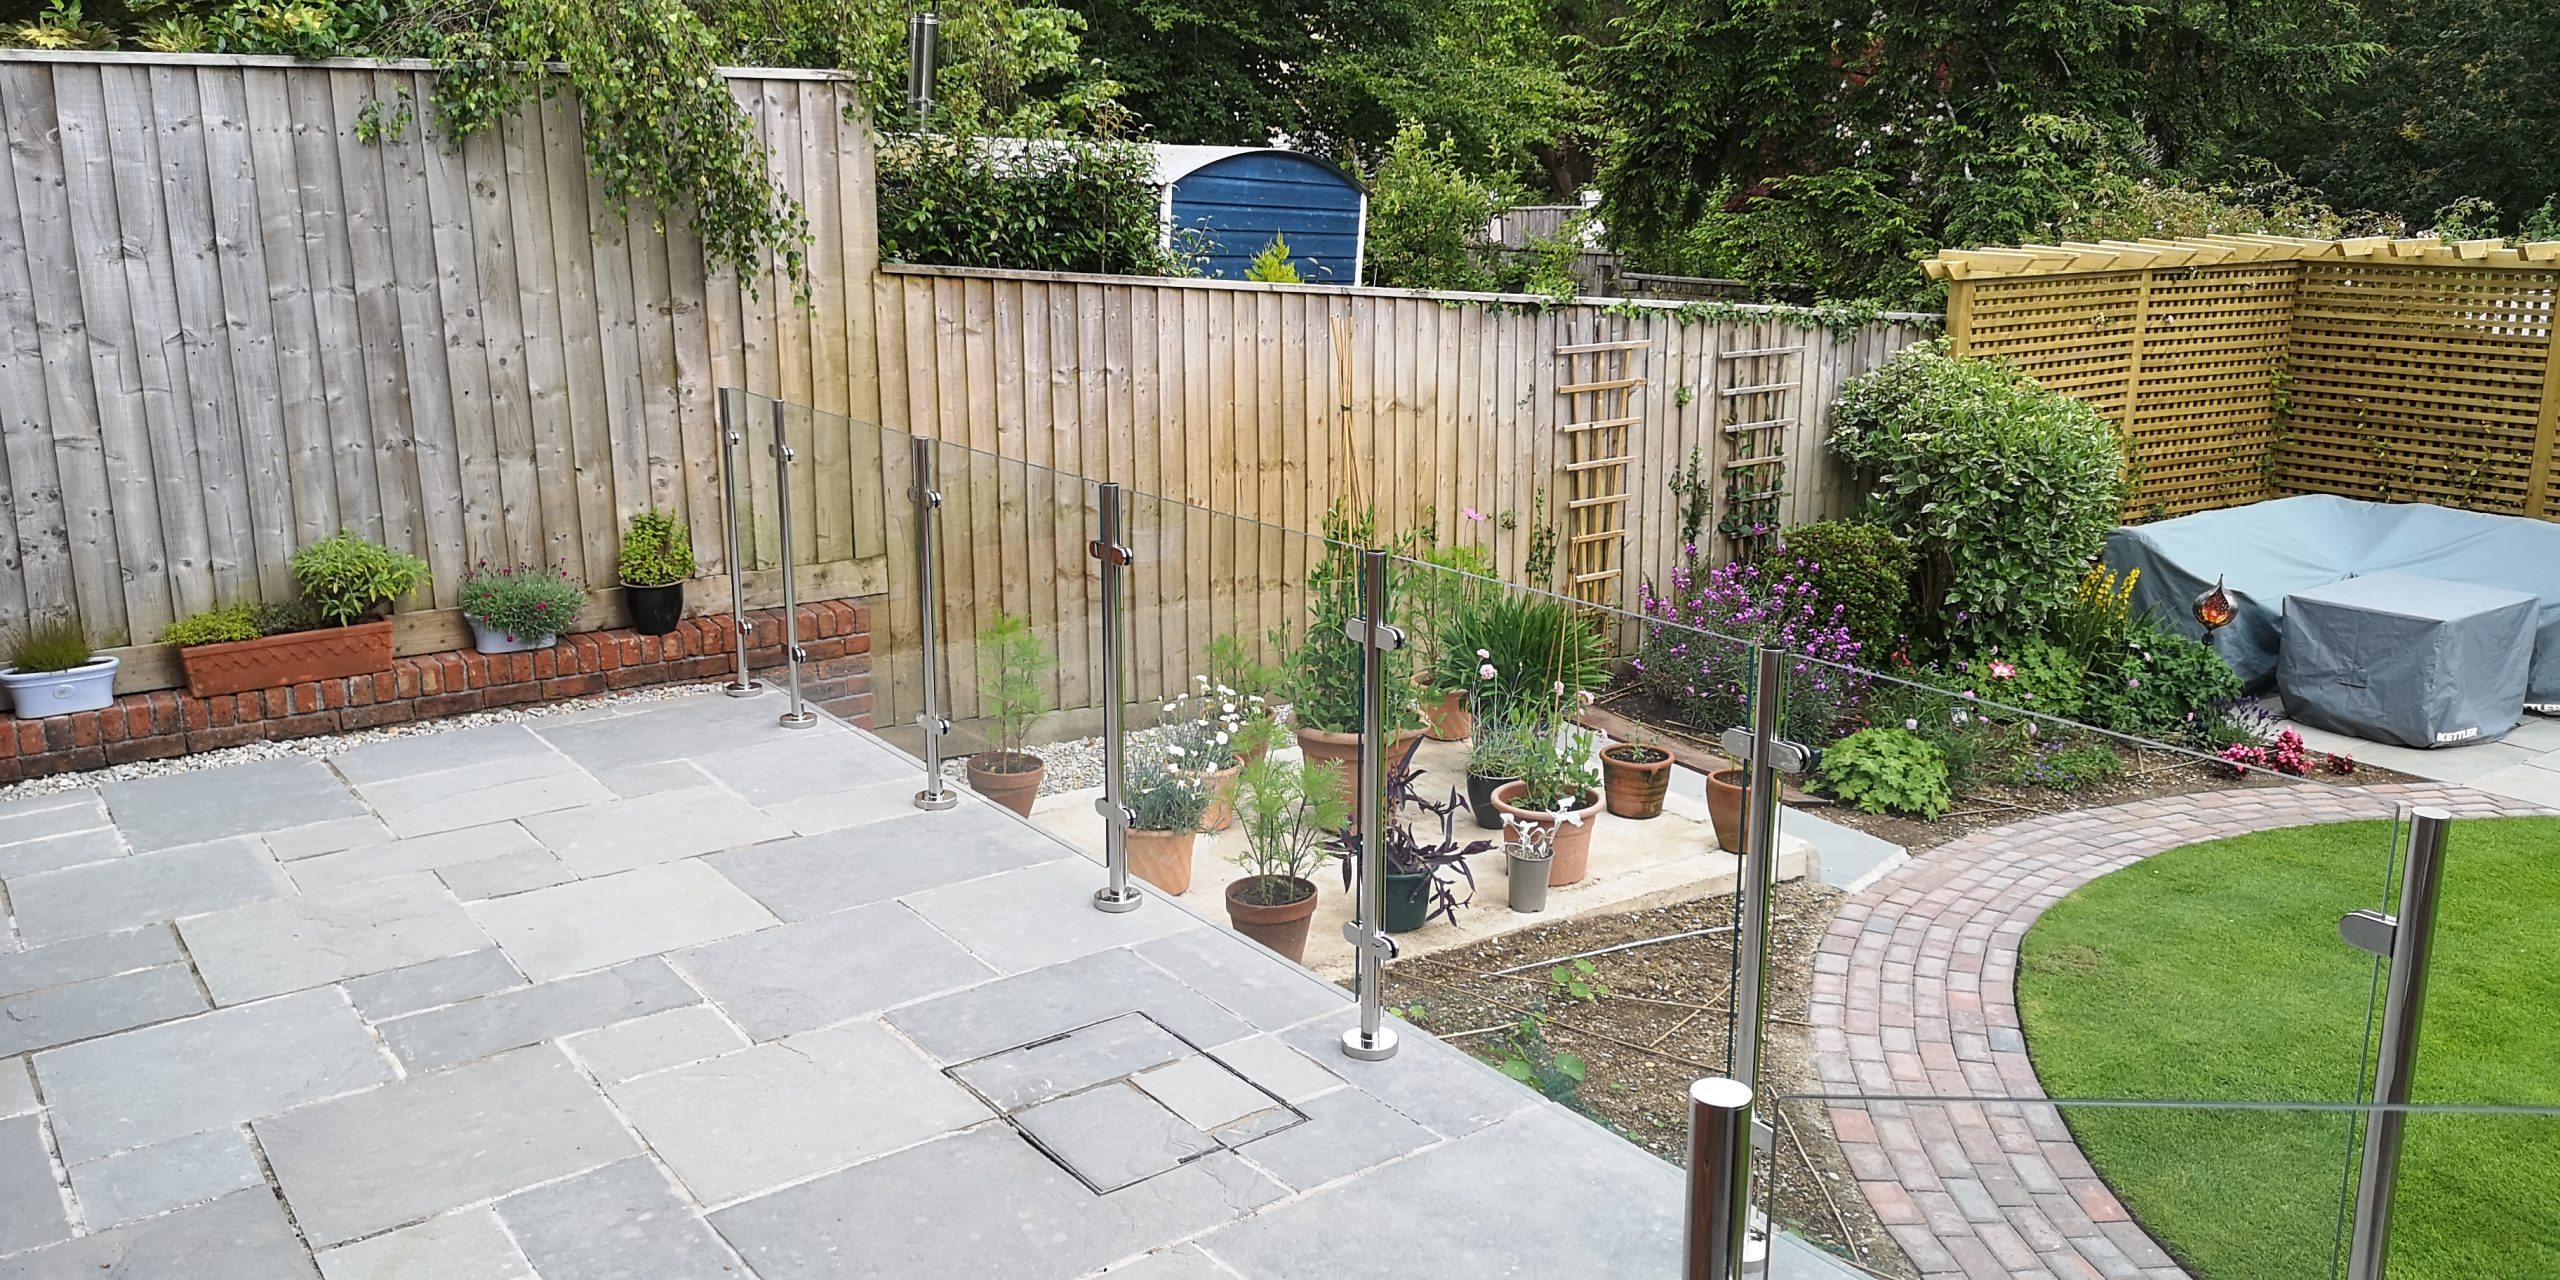 #Landscaping #Gardendesign